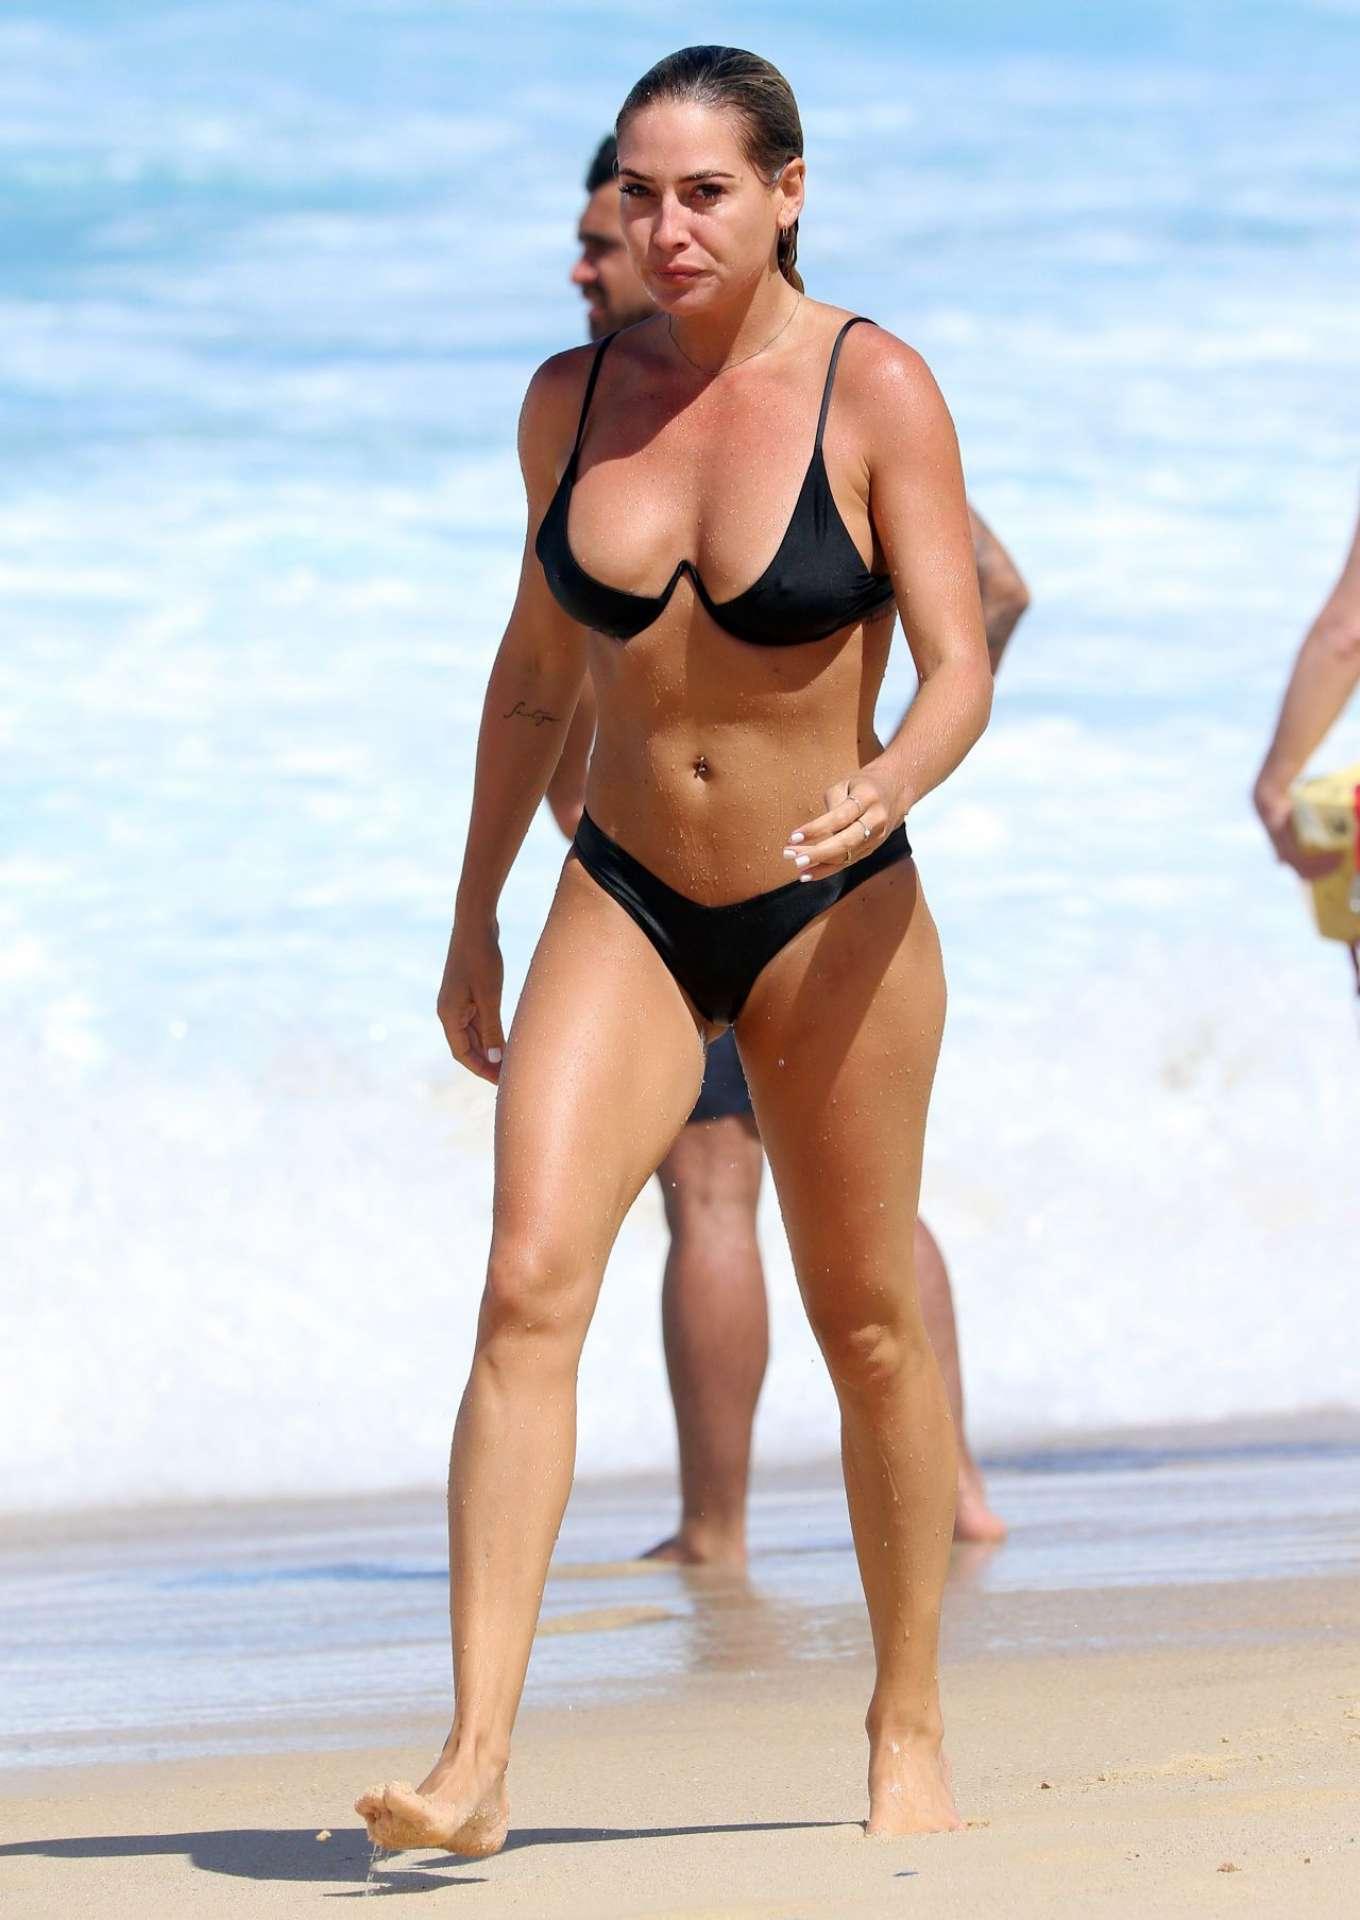 Bikini Lisa Clarke nude (43 photos), Ass, Hot, Selfie, legs 2018